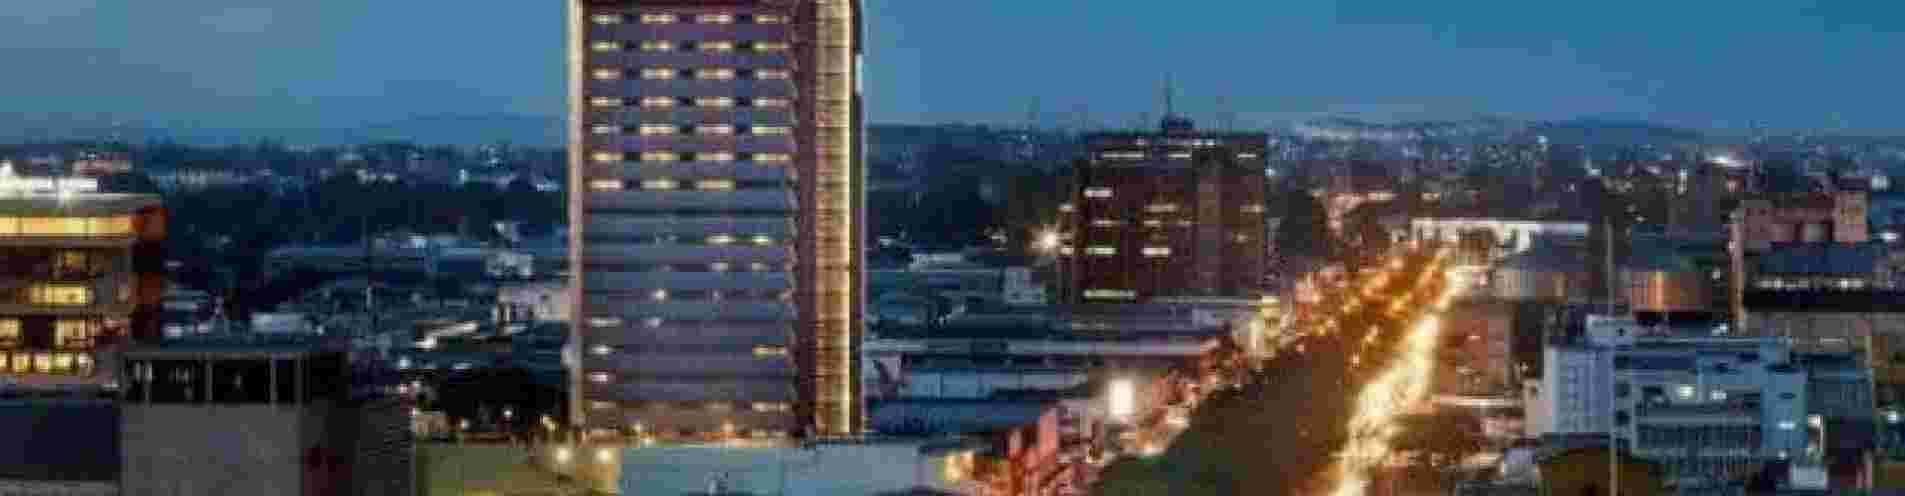 LUSAKA CITY header image